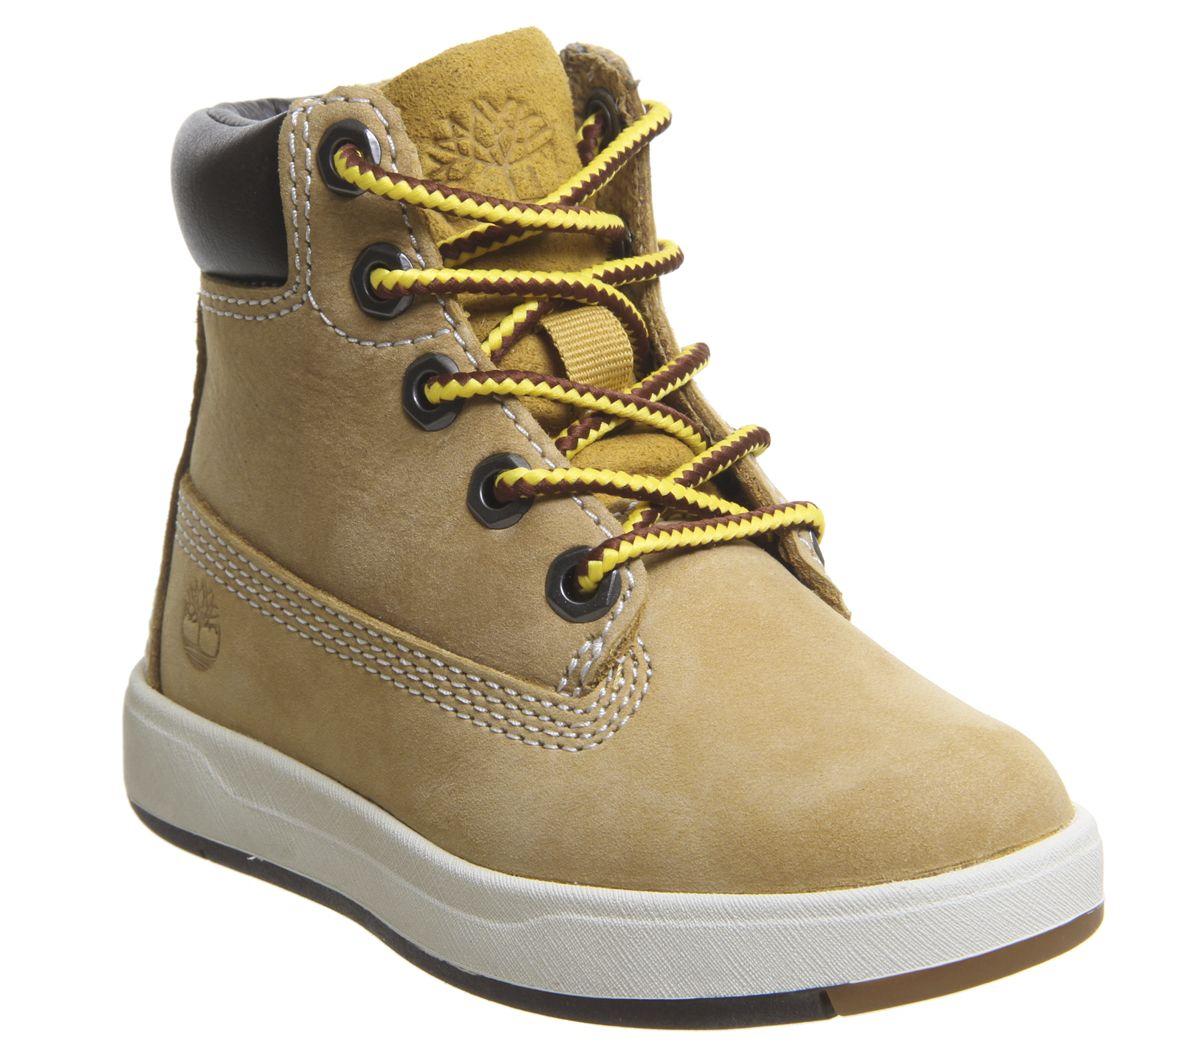 9af15f1f894b1 Timberland Davis Sqaure 6 Inch Boots Infant Wheat Naturebuck - Unisex